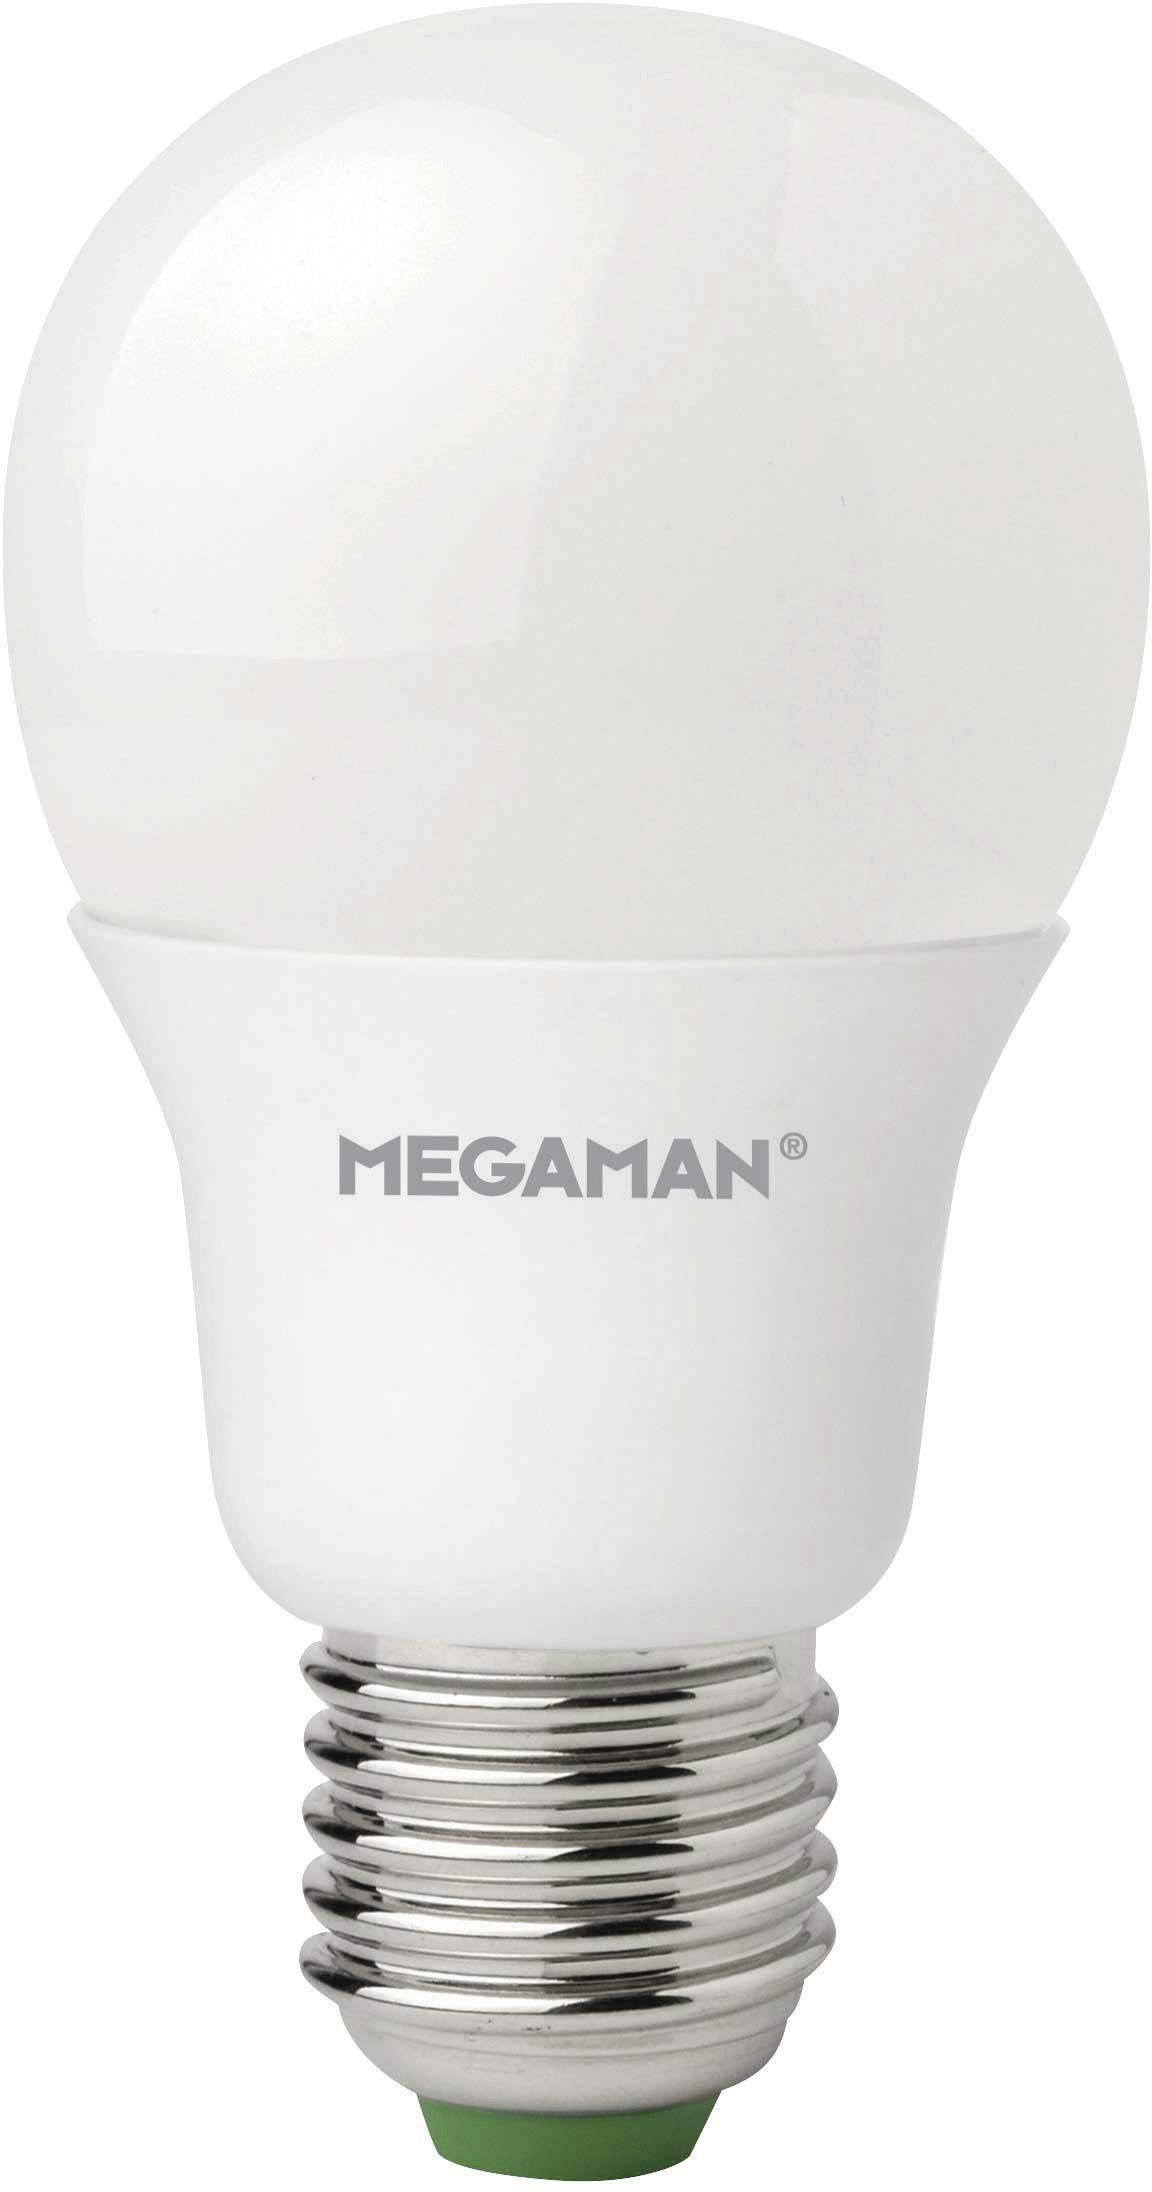 LED žárovka Megaman, MM21043, E27, 5,5 W, 230 V, teplá bílá